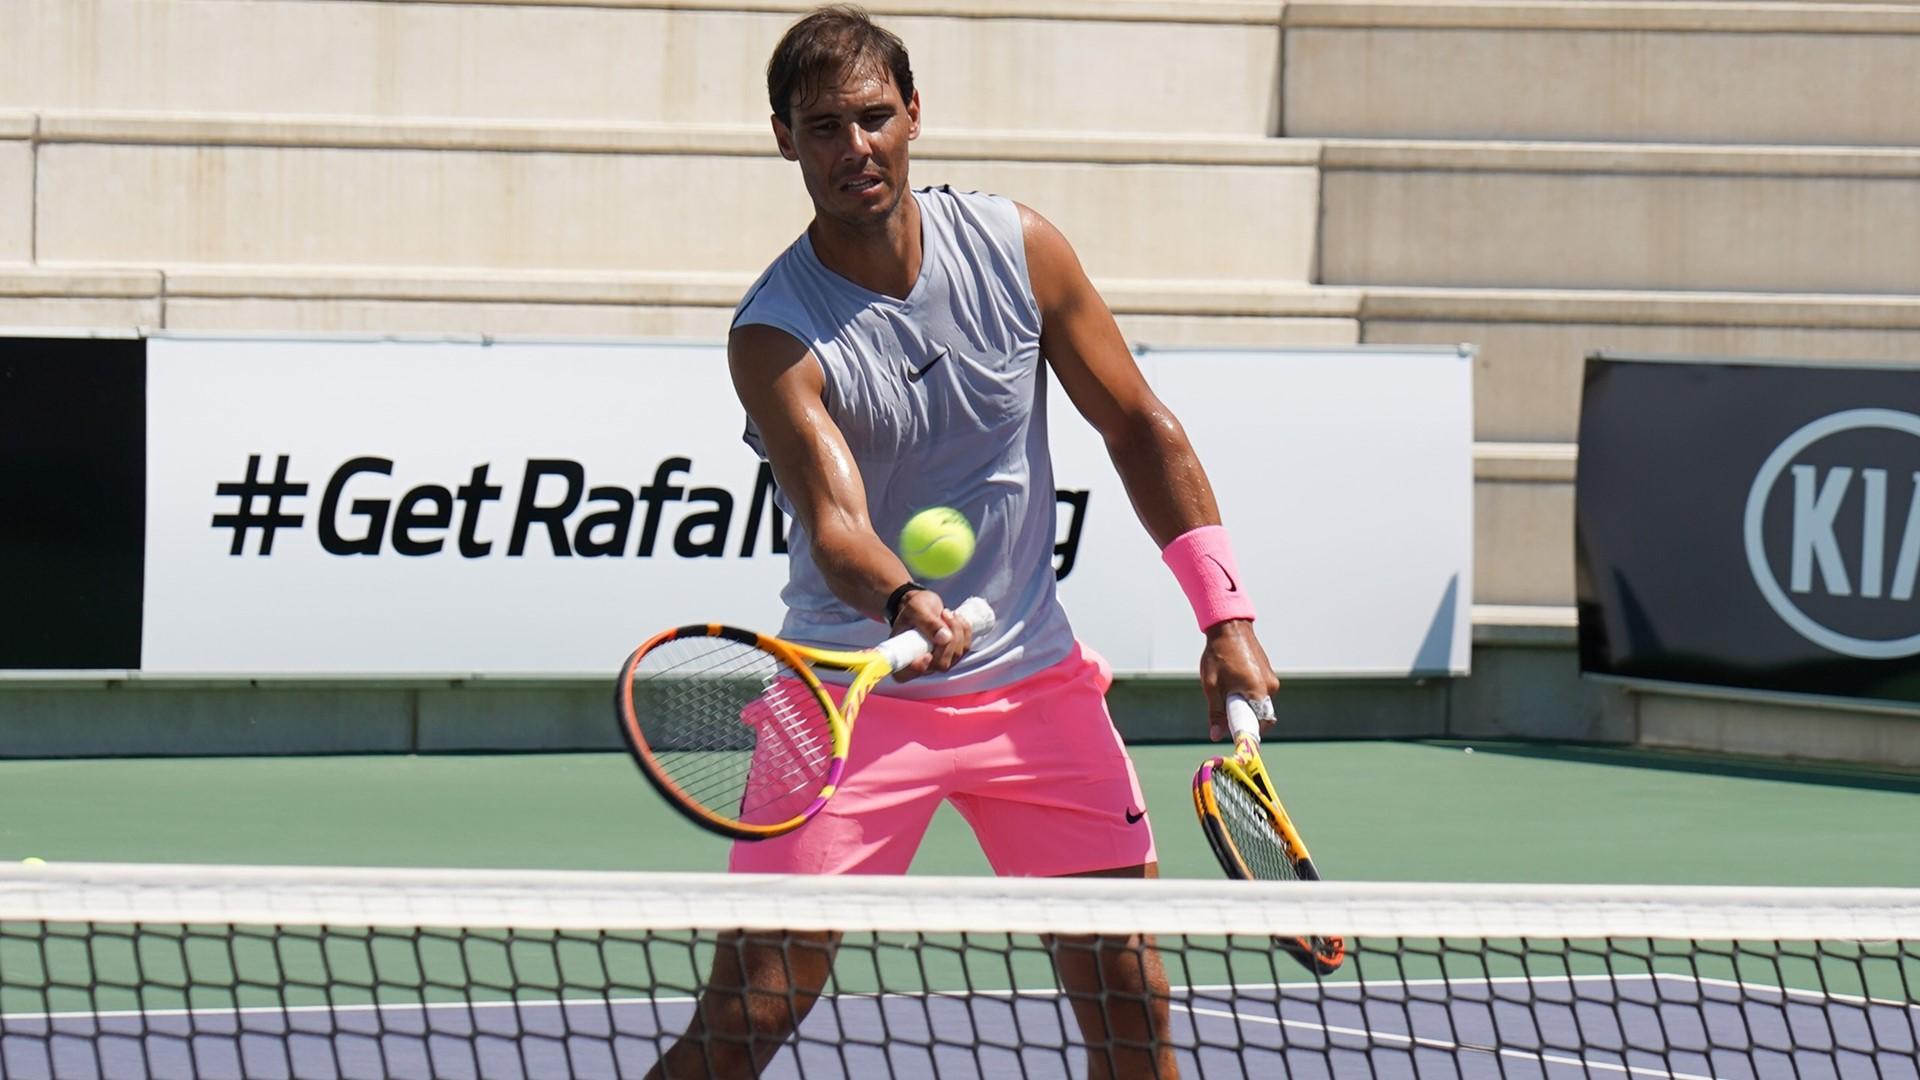 Kia and Rafael Nadal extend brand ambassador partnership in live-stream training session - Image 1